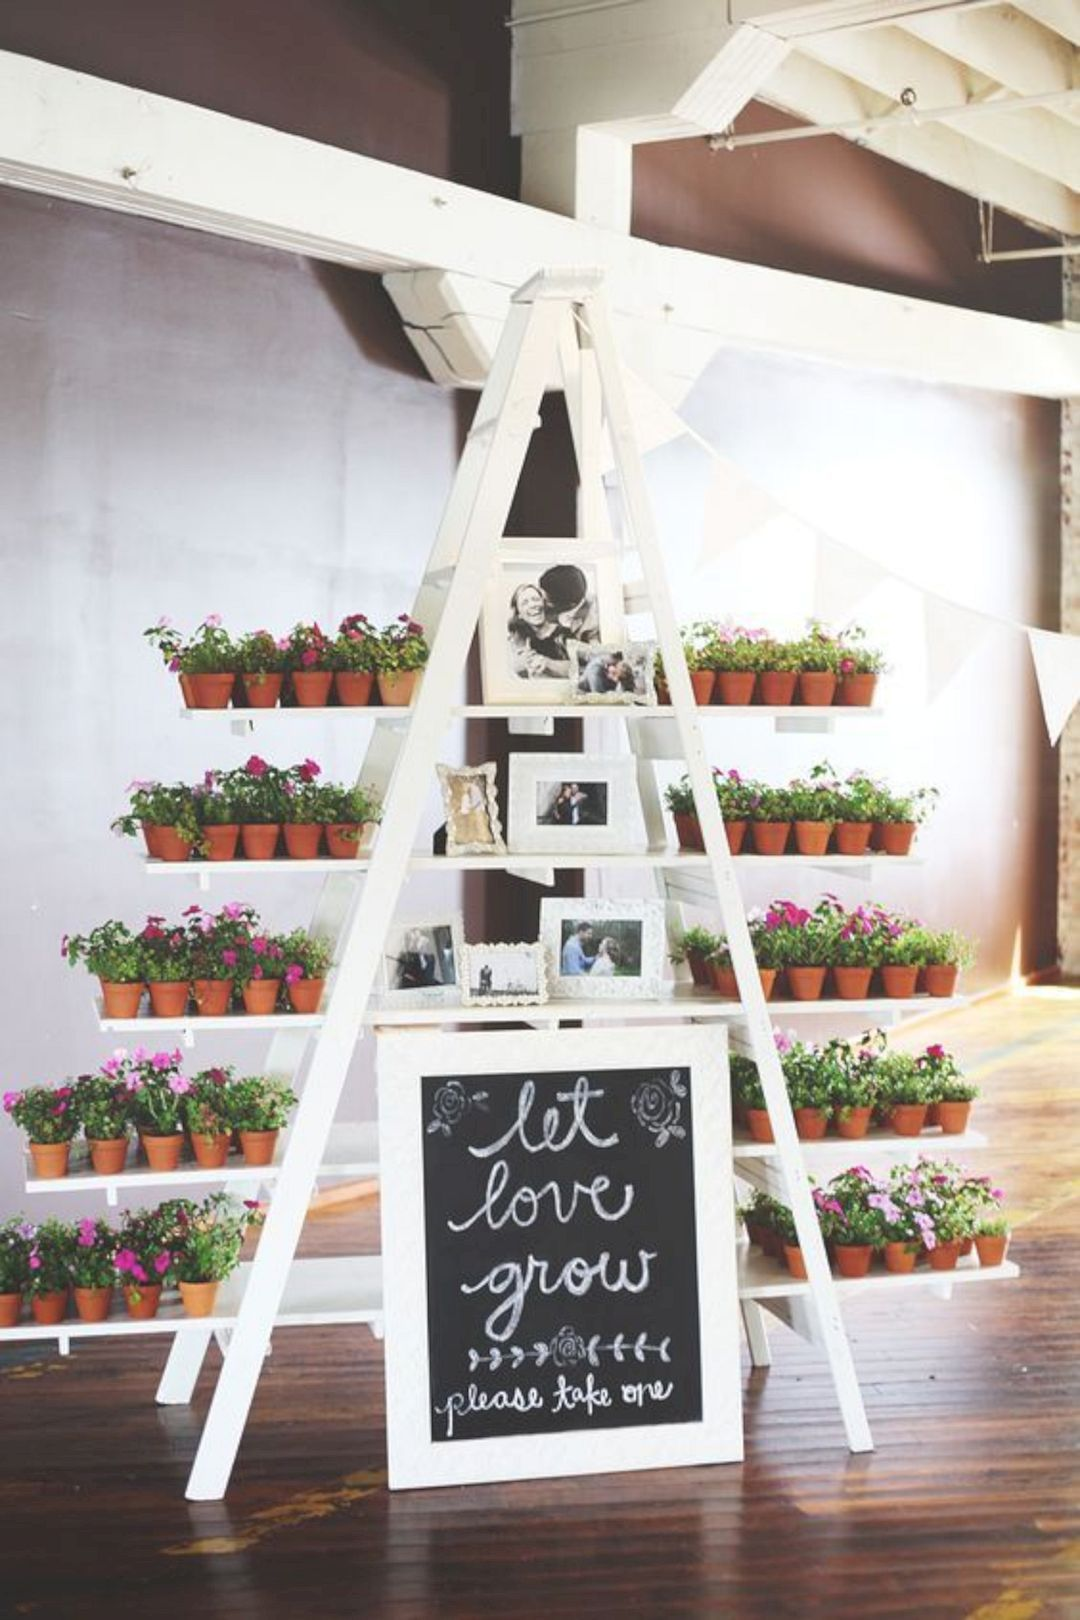 Small Wedding Ideas 8 | Wedding ideas | Pinterest | Weddings ...